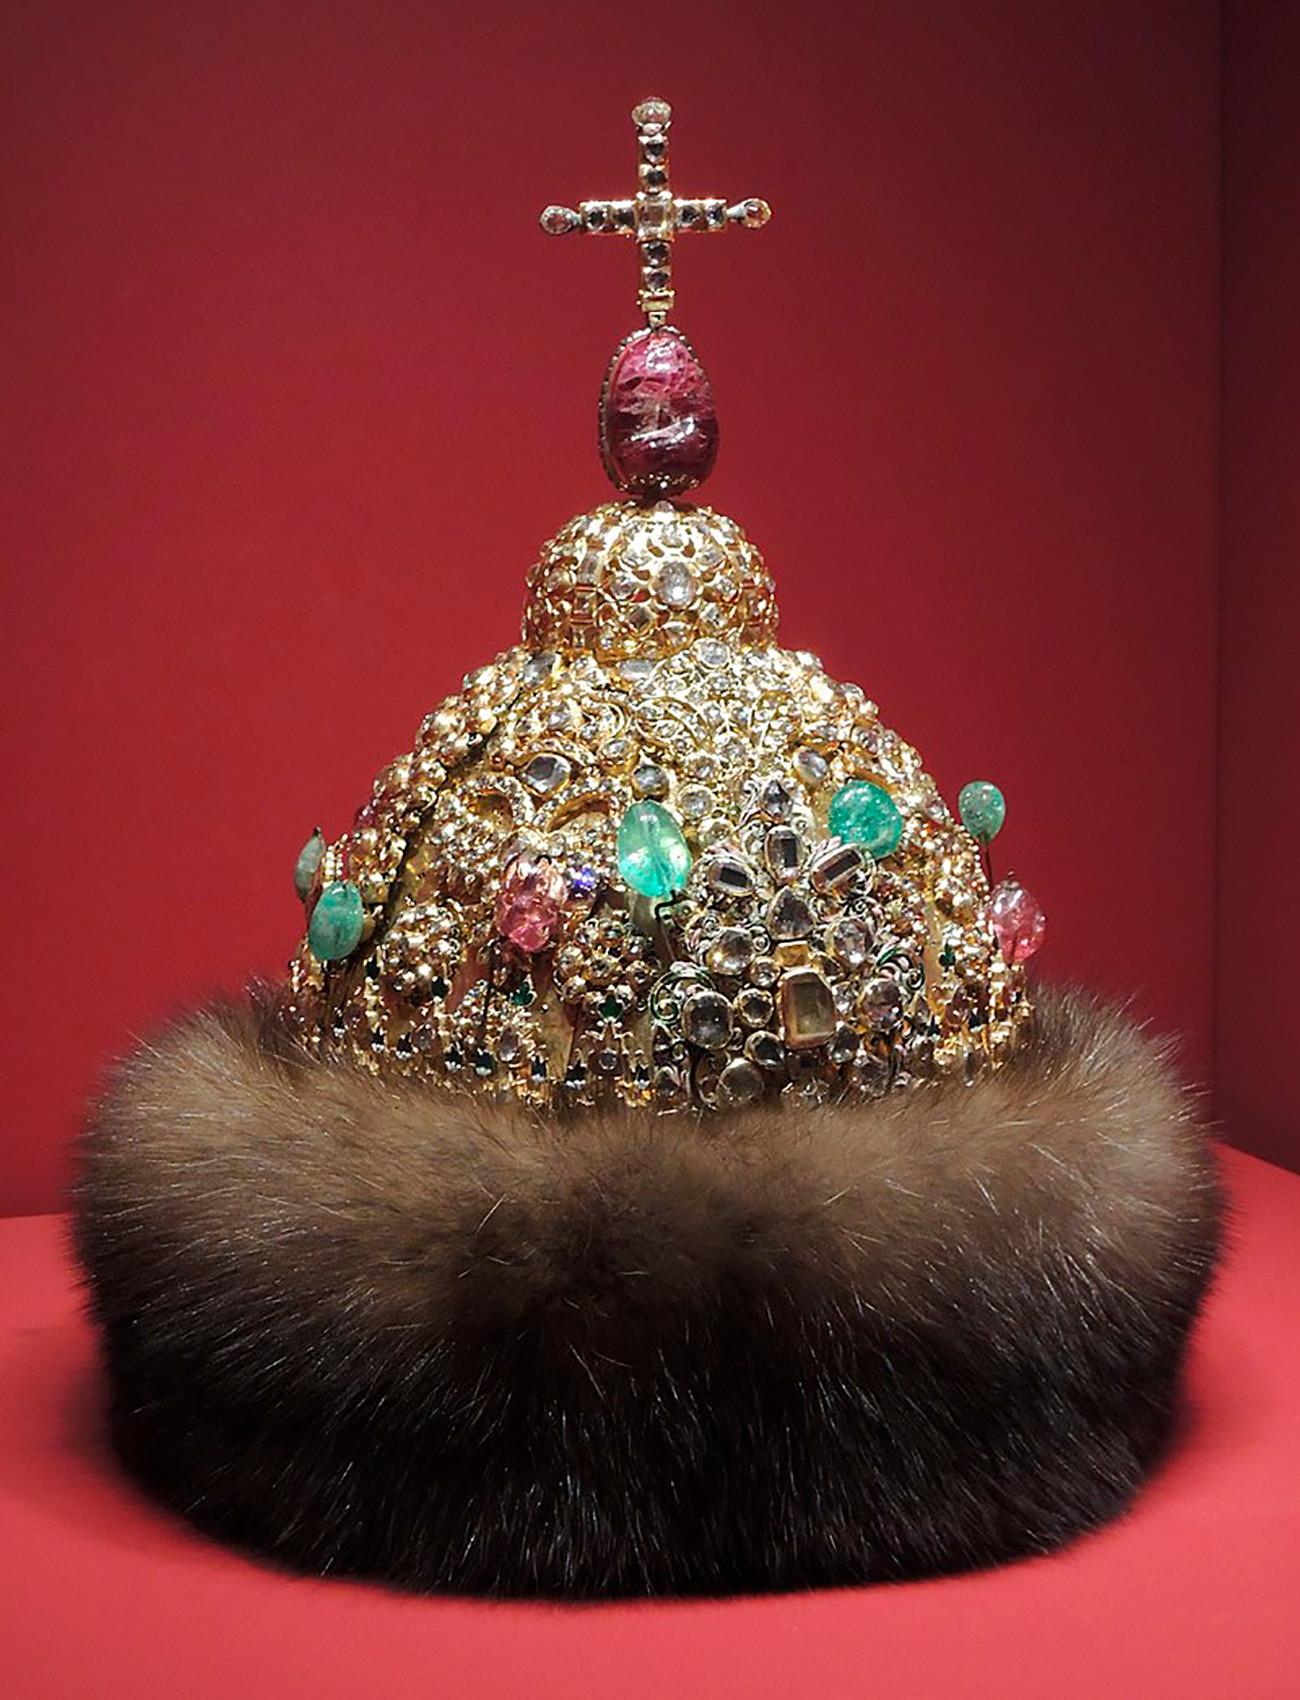 BRILIJANTNA KRUNA. Radionice Moskovskog Kremlja, oko 1680. Srebro, zlato, drago kamenje, brilijanti; lijevanje, iskucavanje, graviranje.